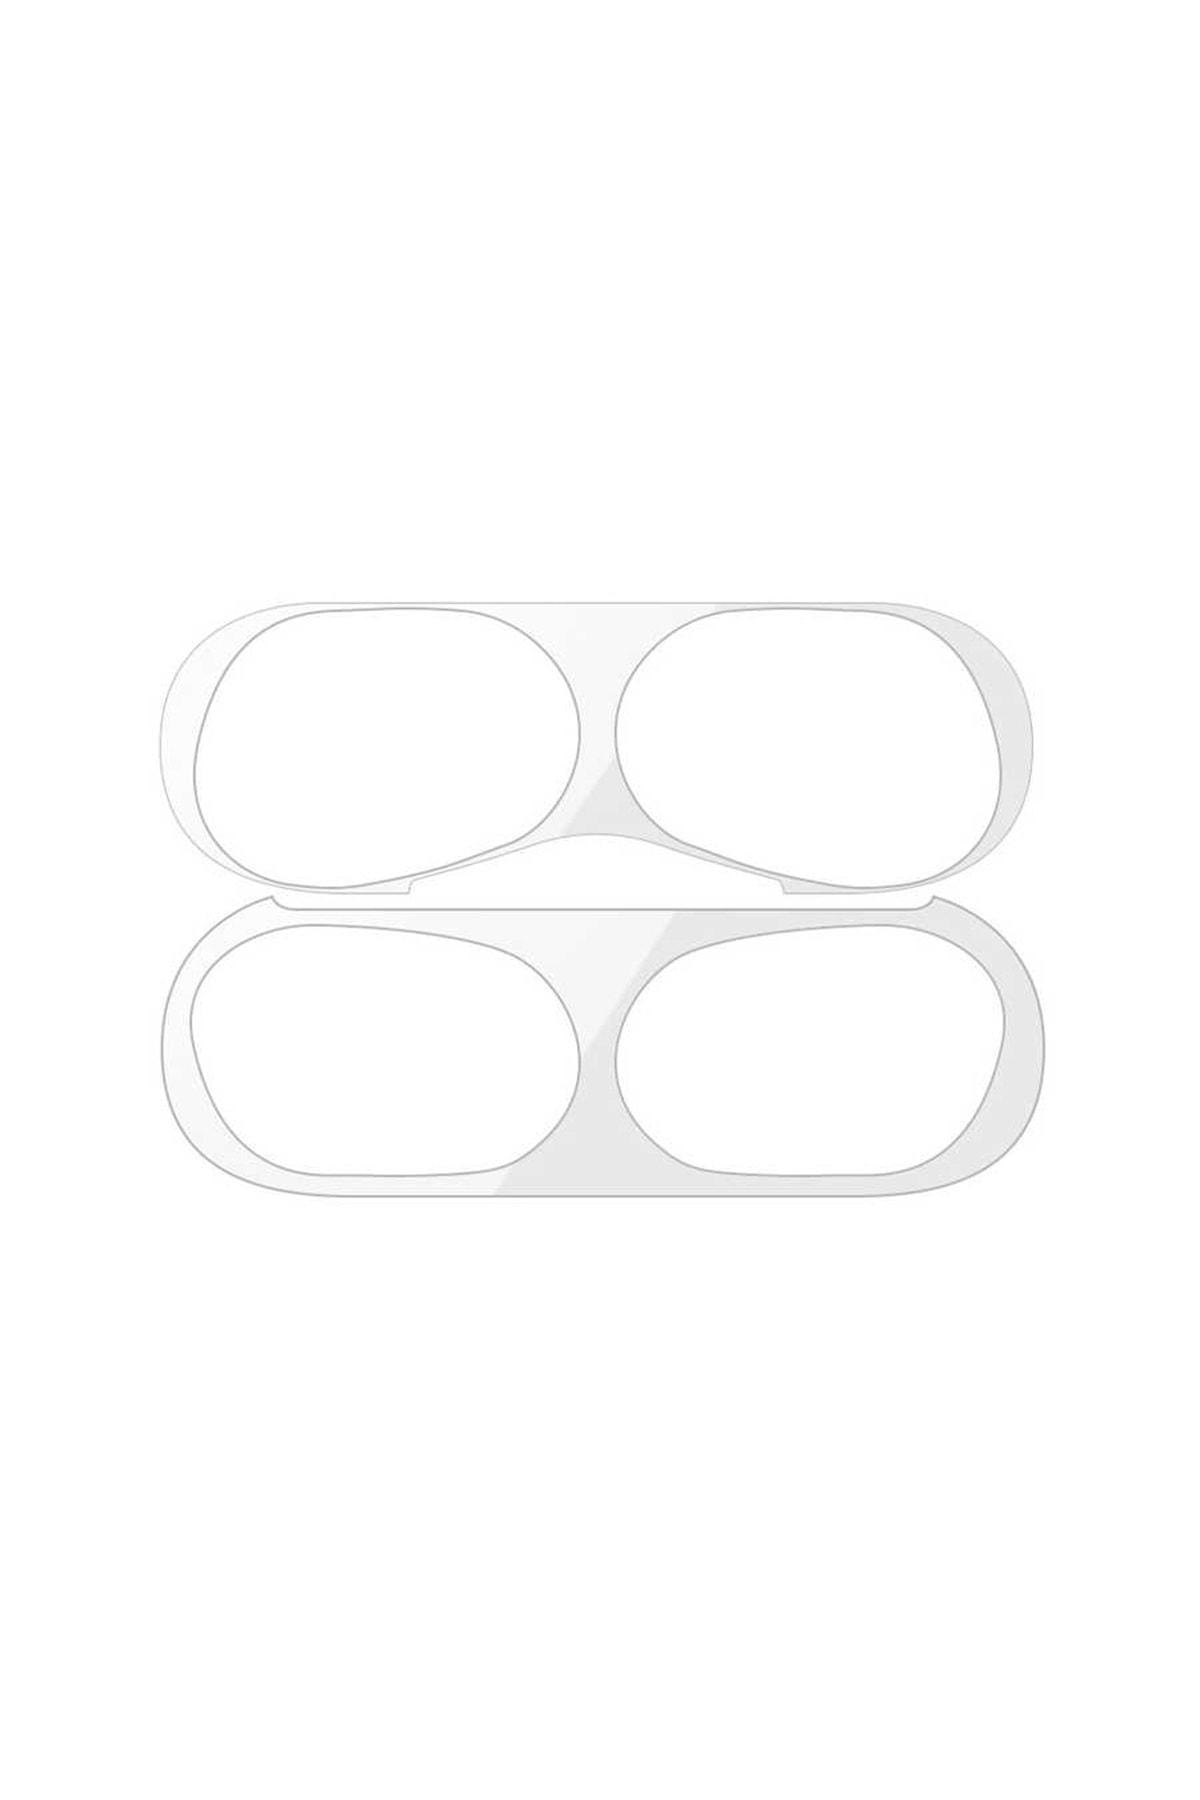 zore Airpods Pro Uyumlu Toz Önleyici Sticker 1